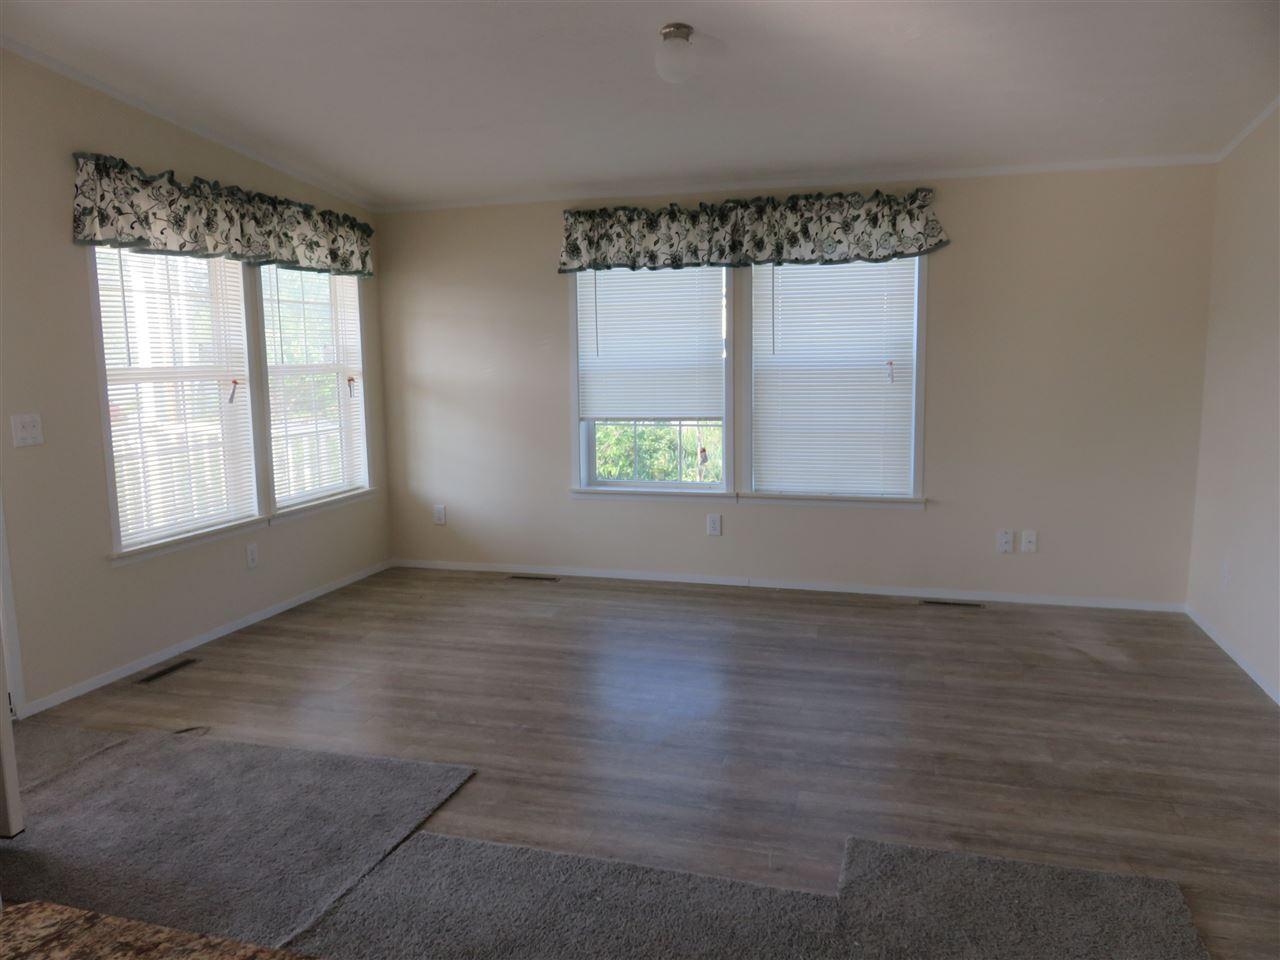 Living Room 12325550